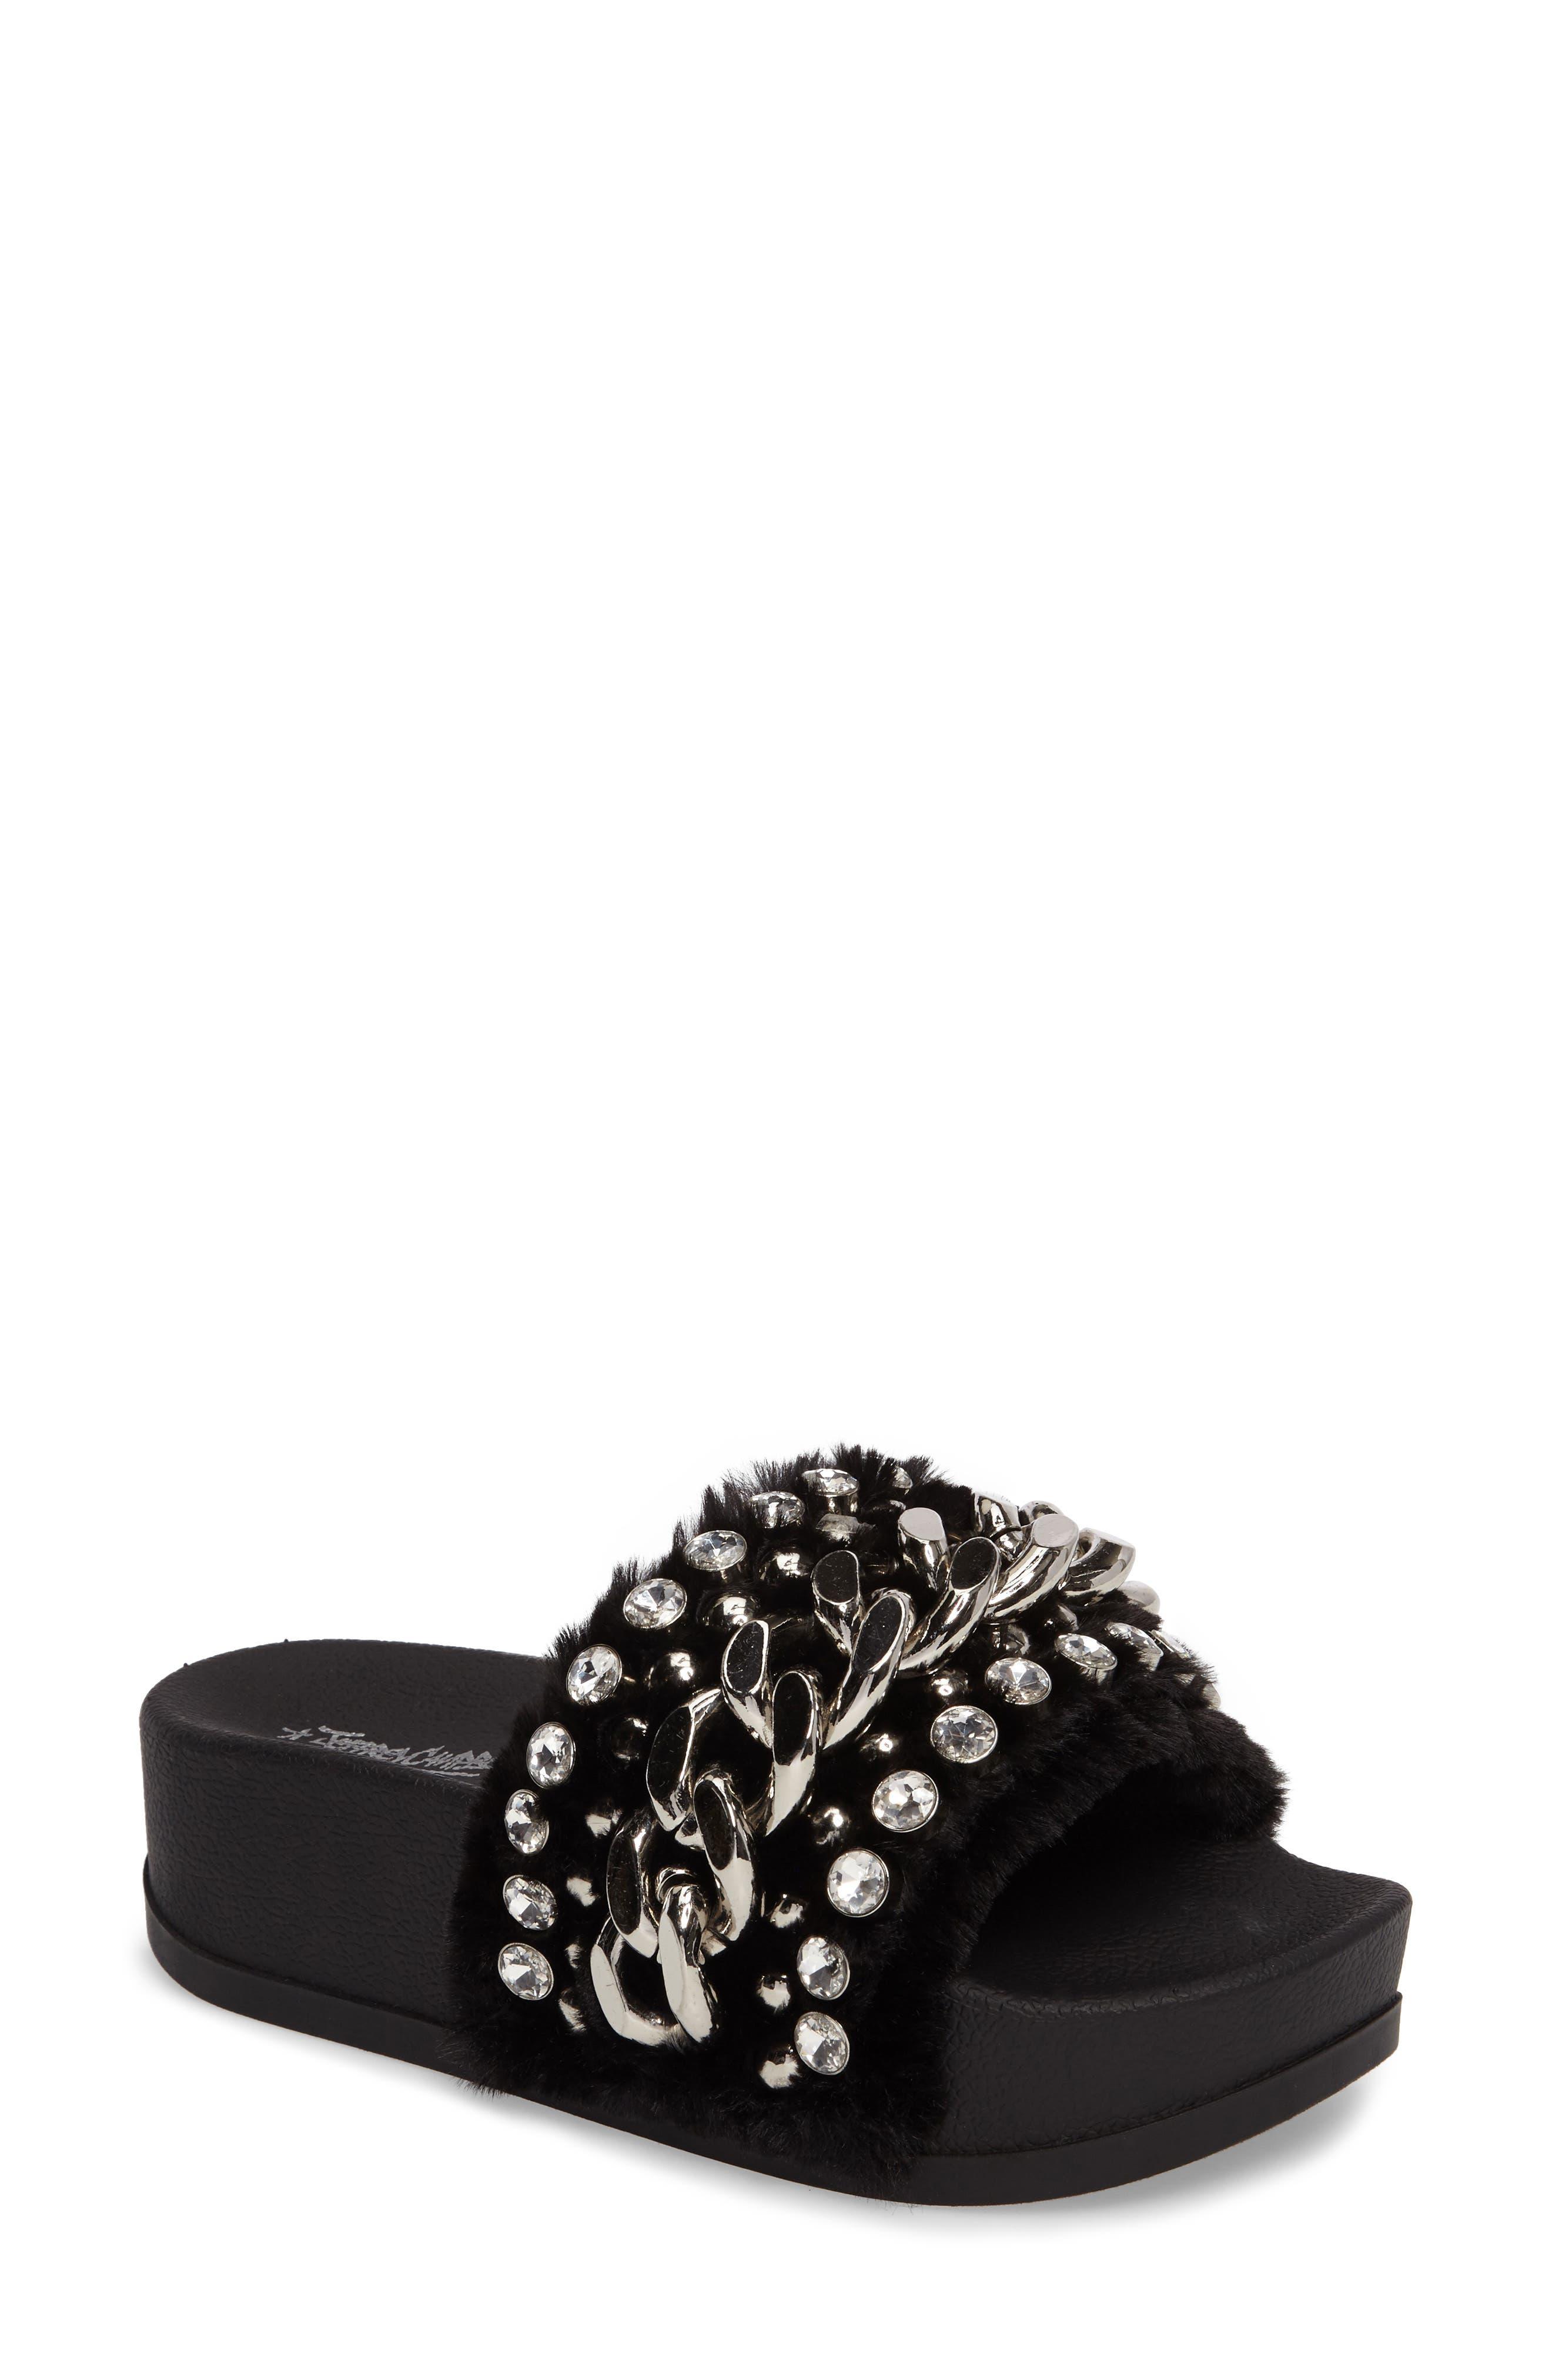 Alternate Image 1 Selected - Jeffrey Campbell Edie Faux Fur Slide Sandal (Women)